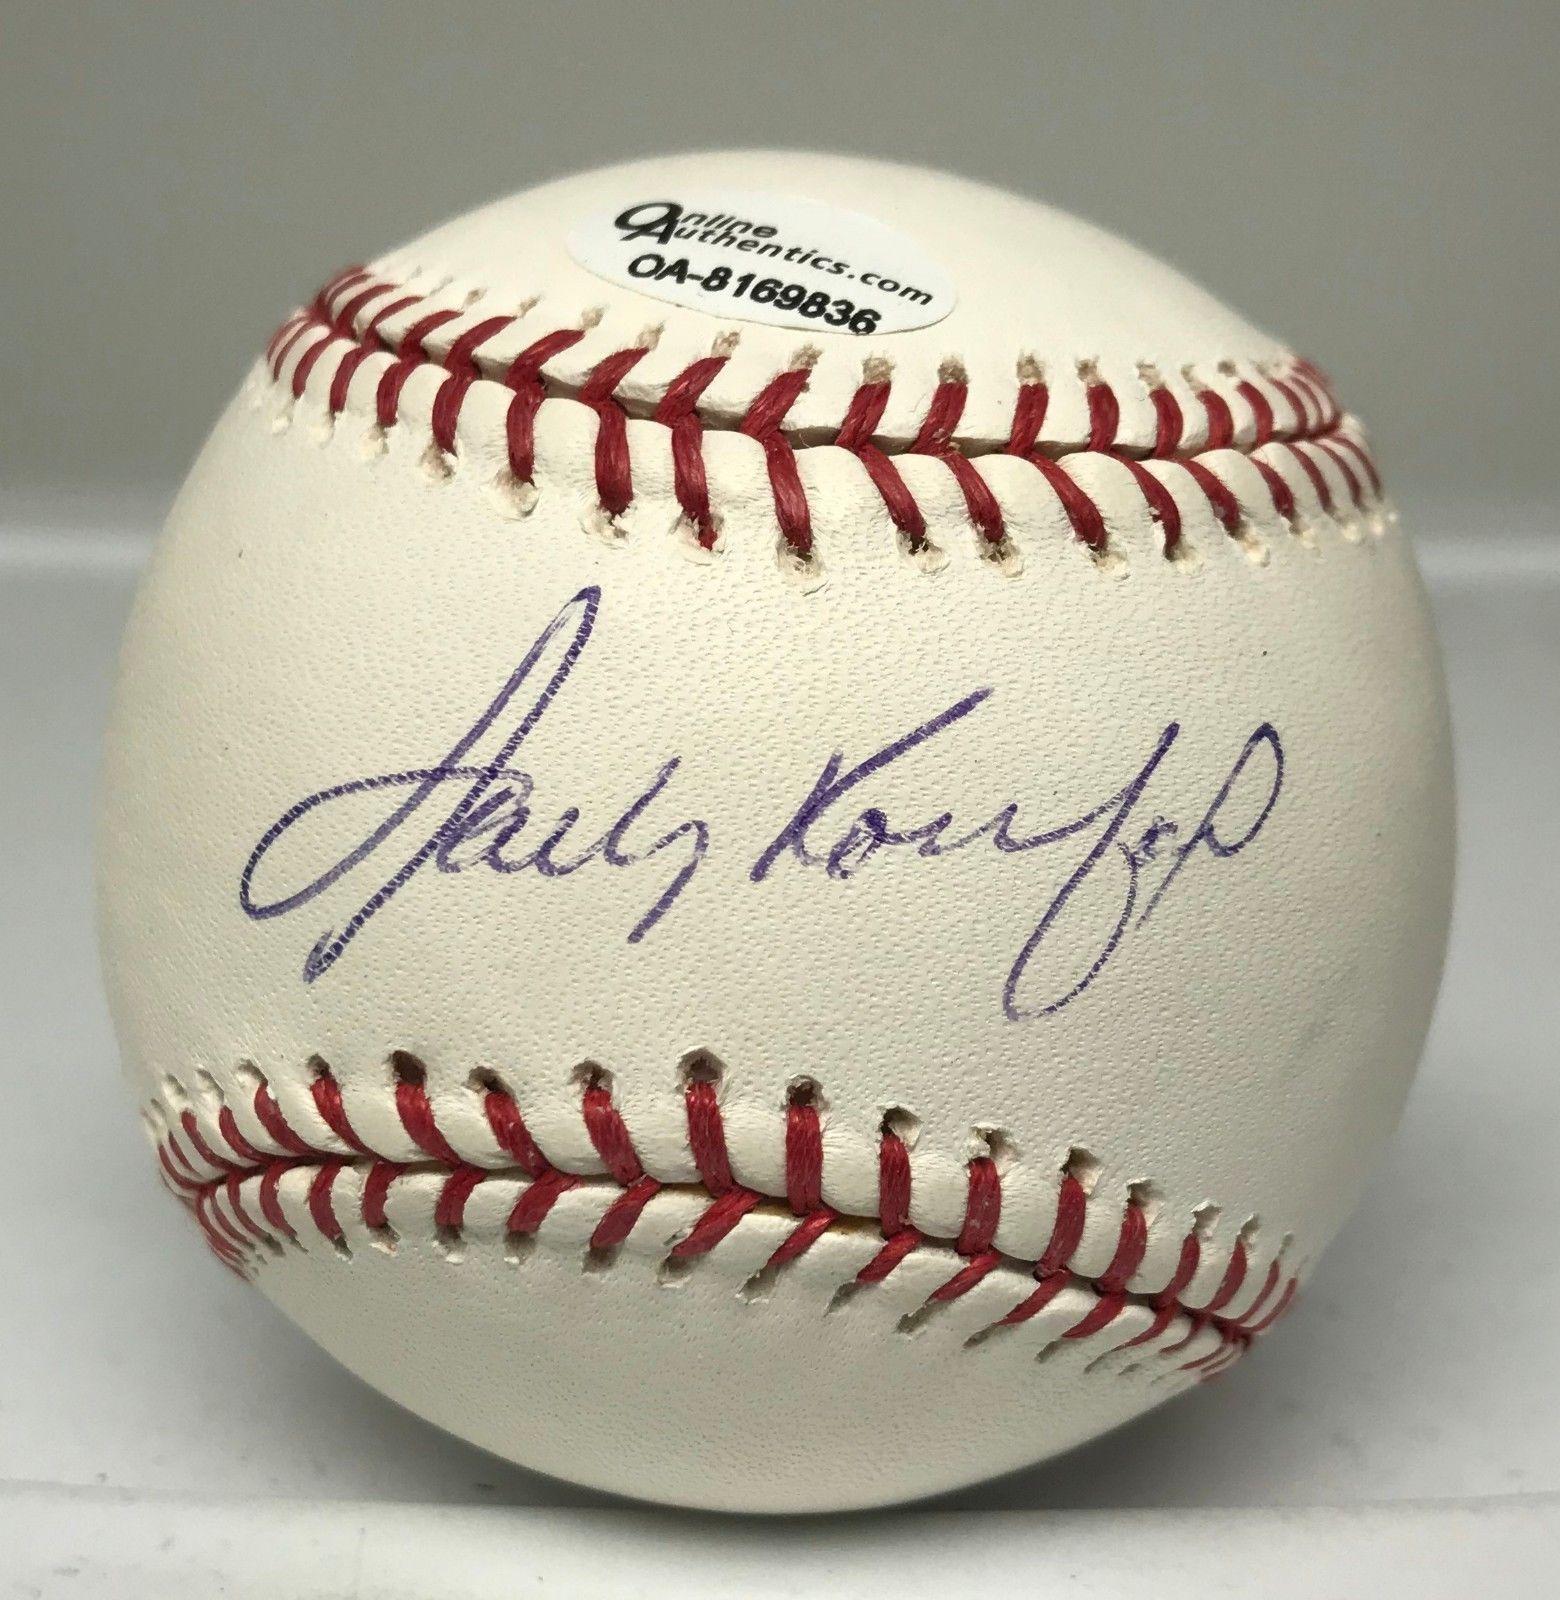 91a1083ad Sandy Koufax Signed Baseball Autograph PSA DNA 10 GEM MINT LOA Dodgers HOF   Baseball